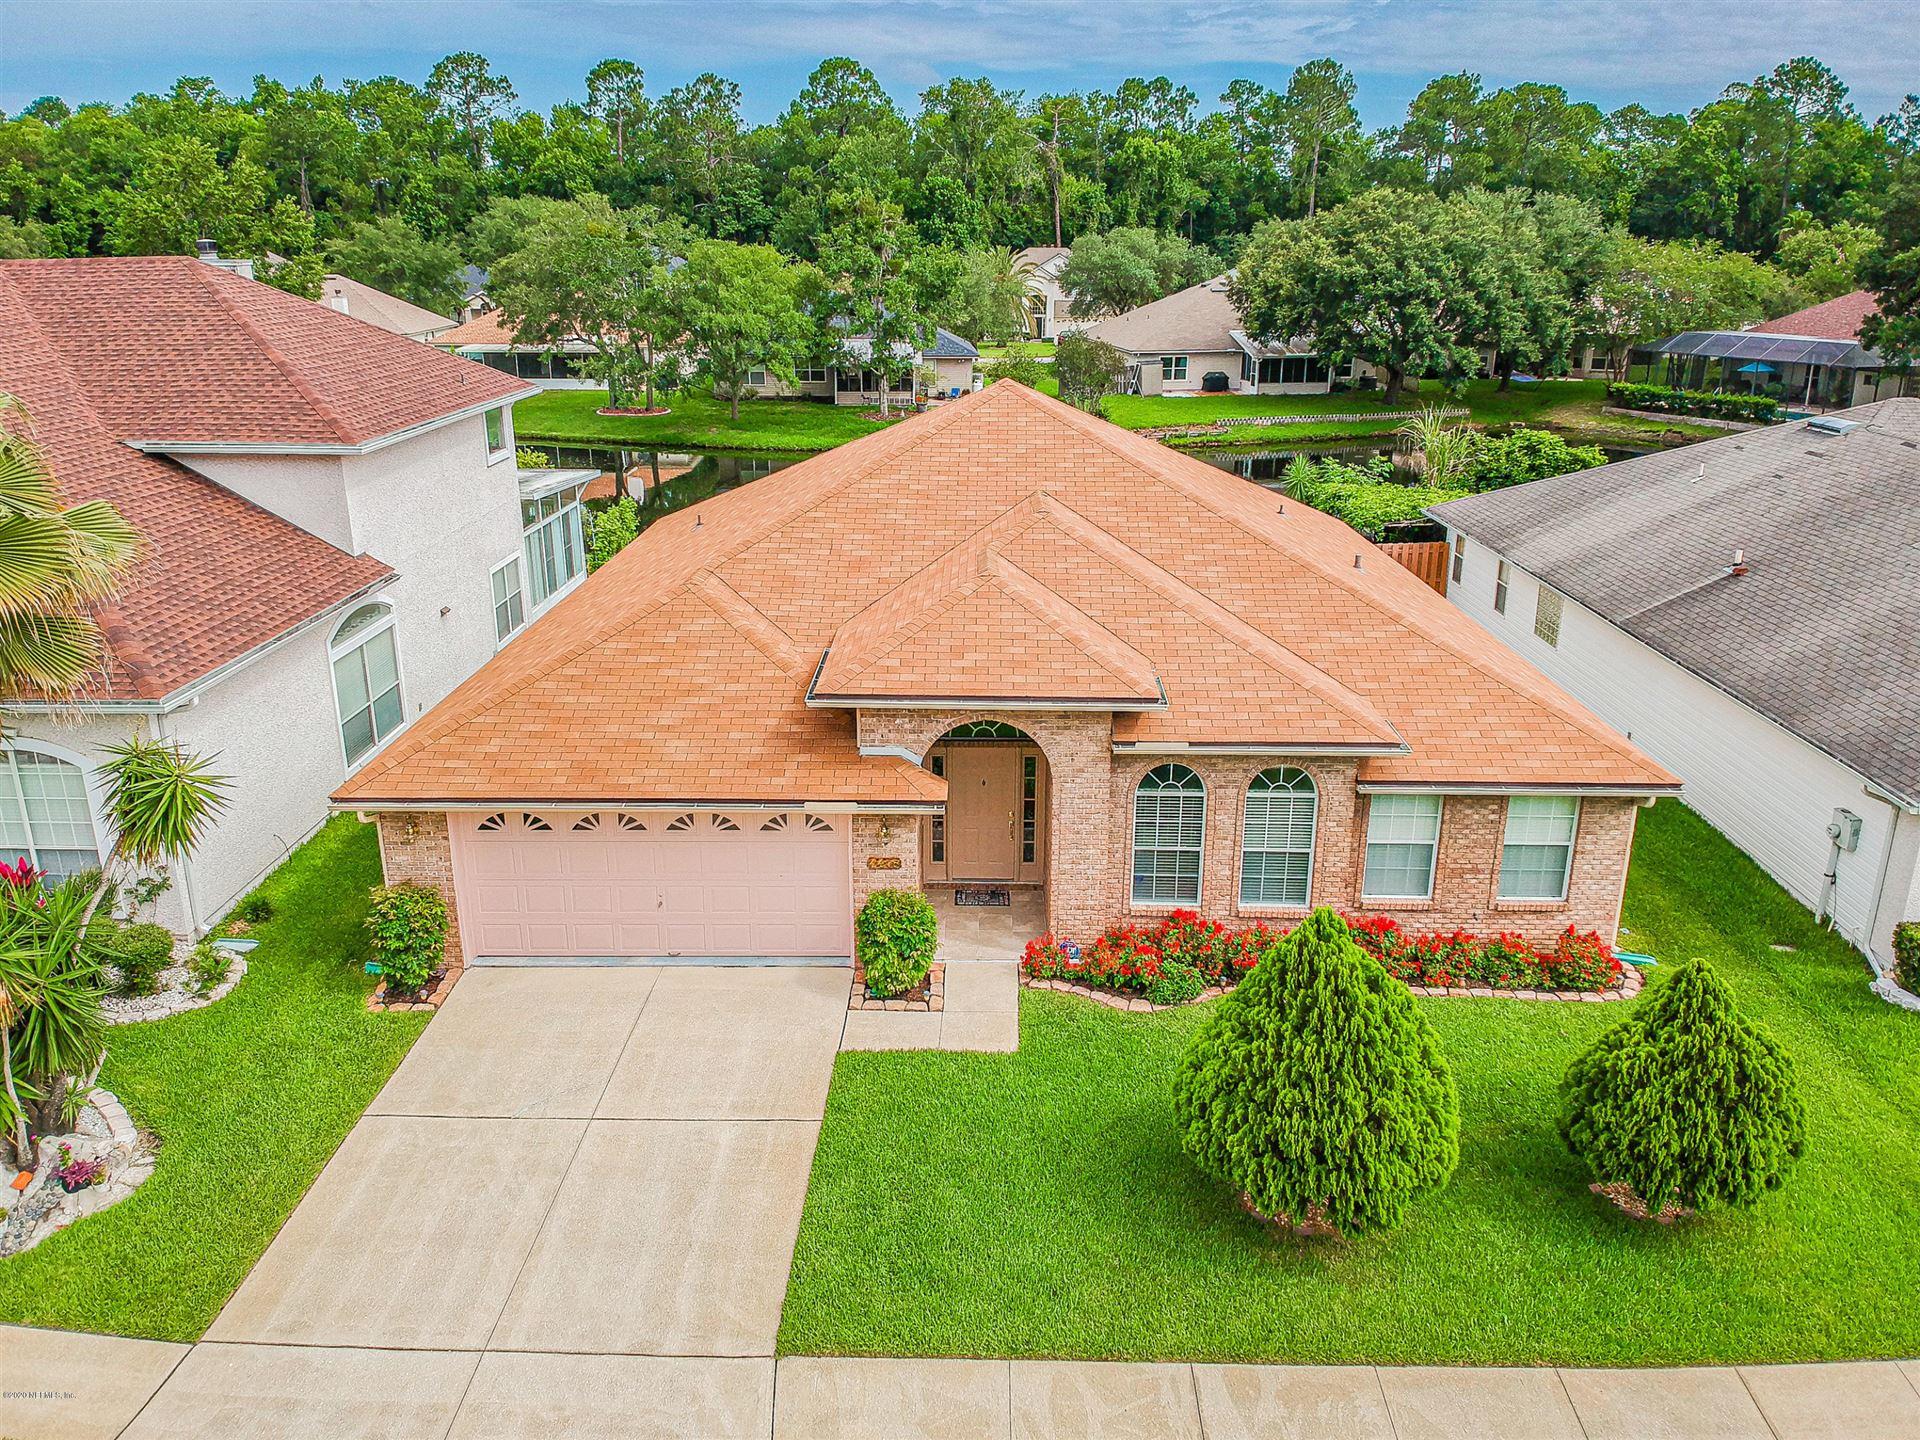 4475 SUMMER HEAVEN BLVD S, Jacksonville, FL 32258 - MLS#: 1073619